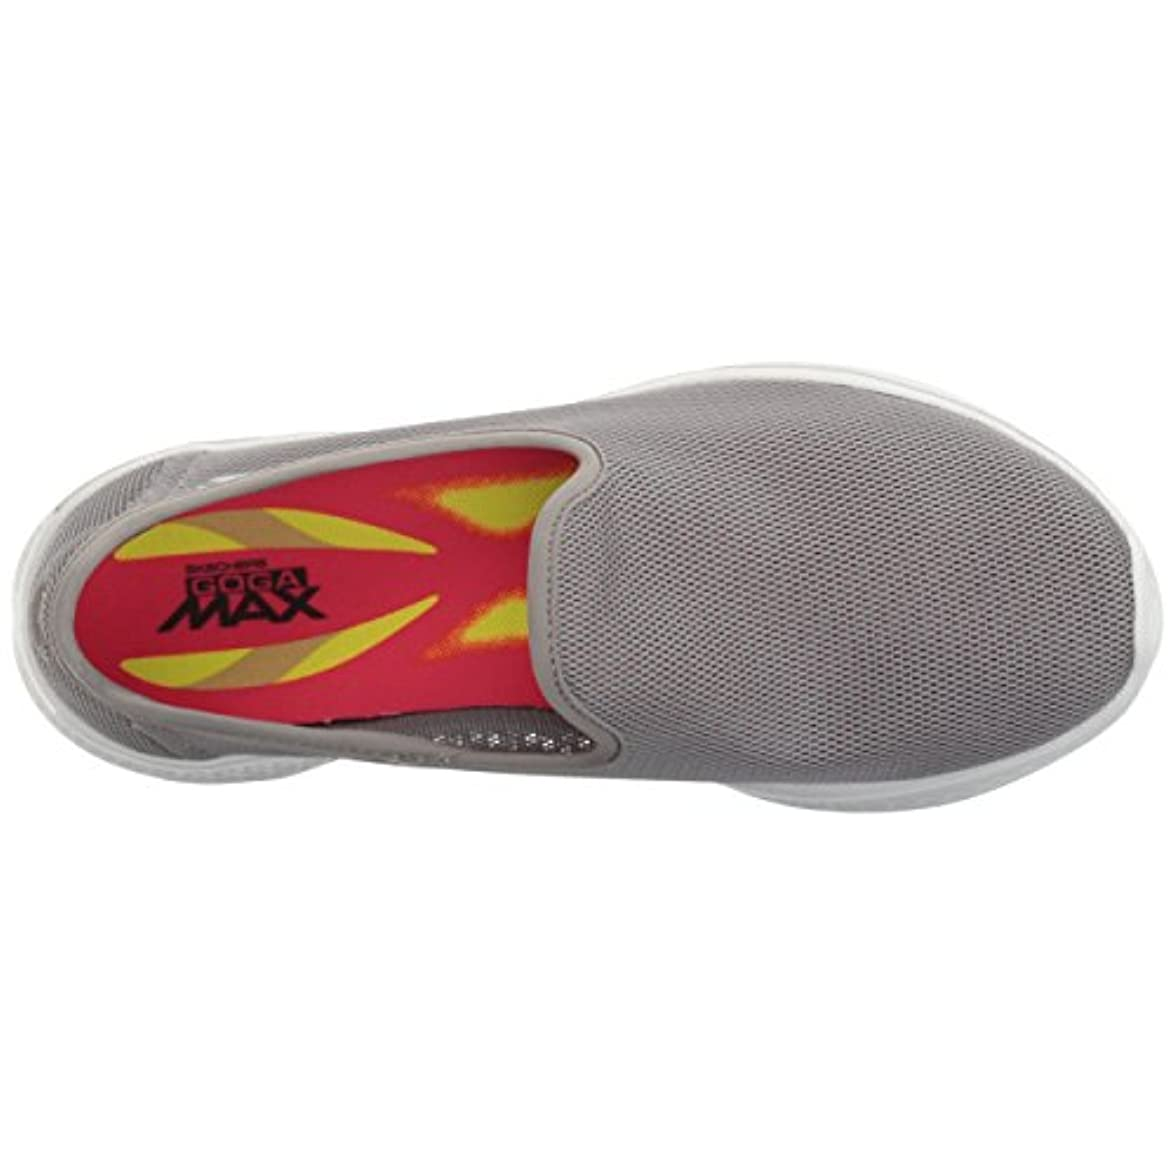 Skechers Go Walk 4 Airy Donna Us 9 5 Grigio Scarpa De Passeggio